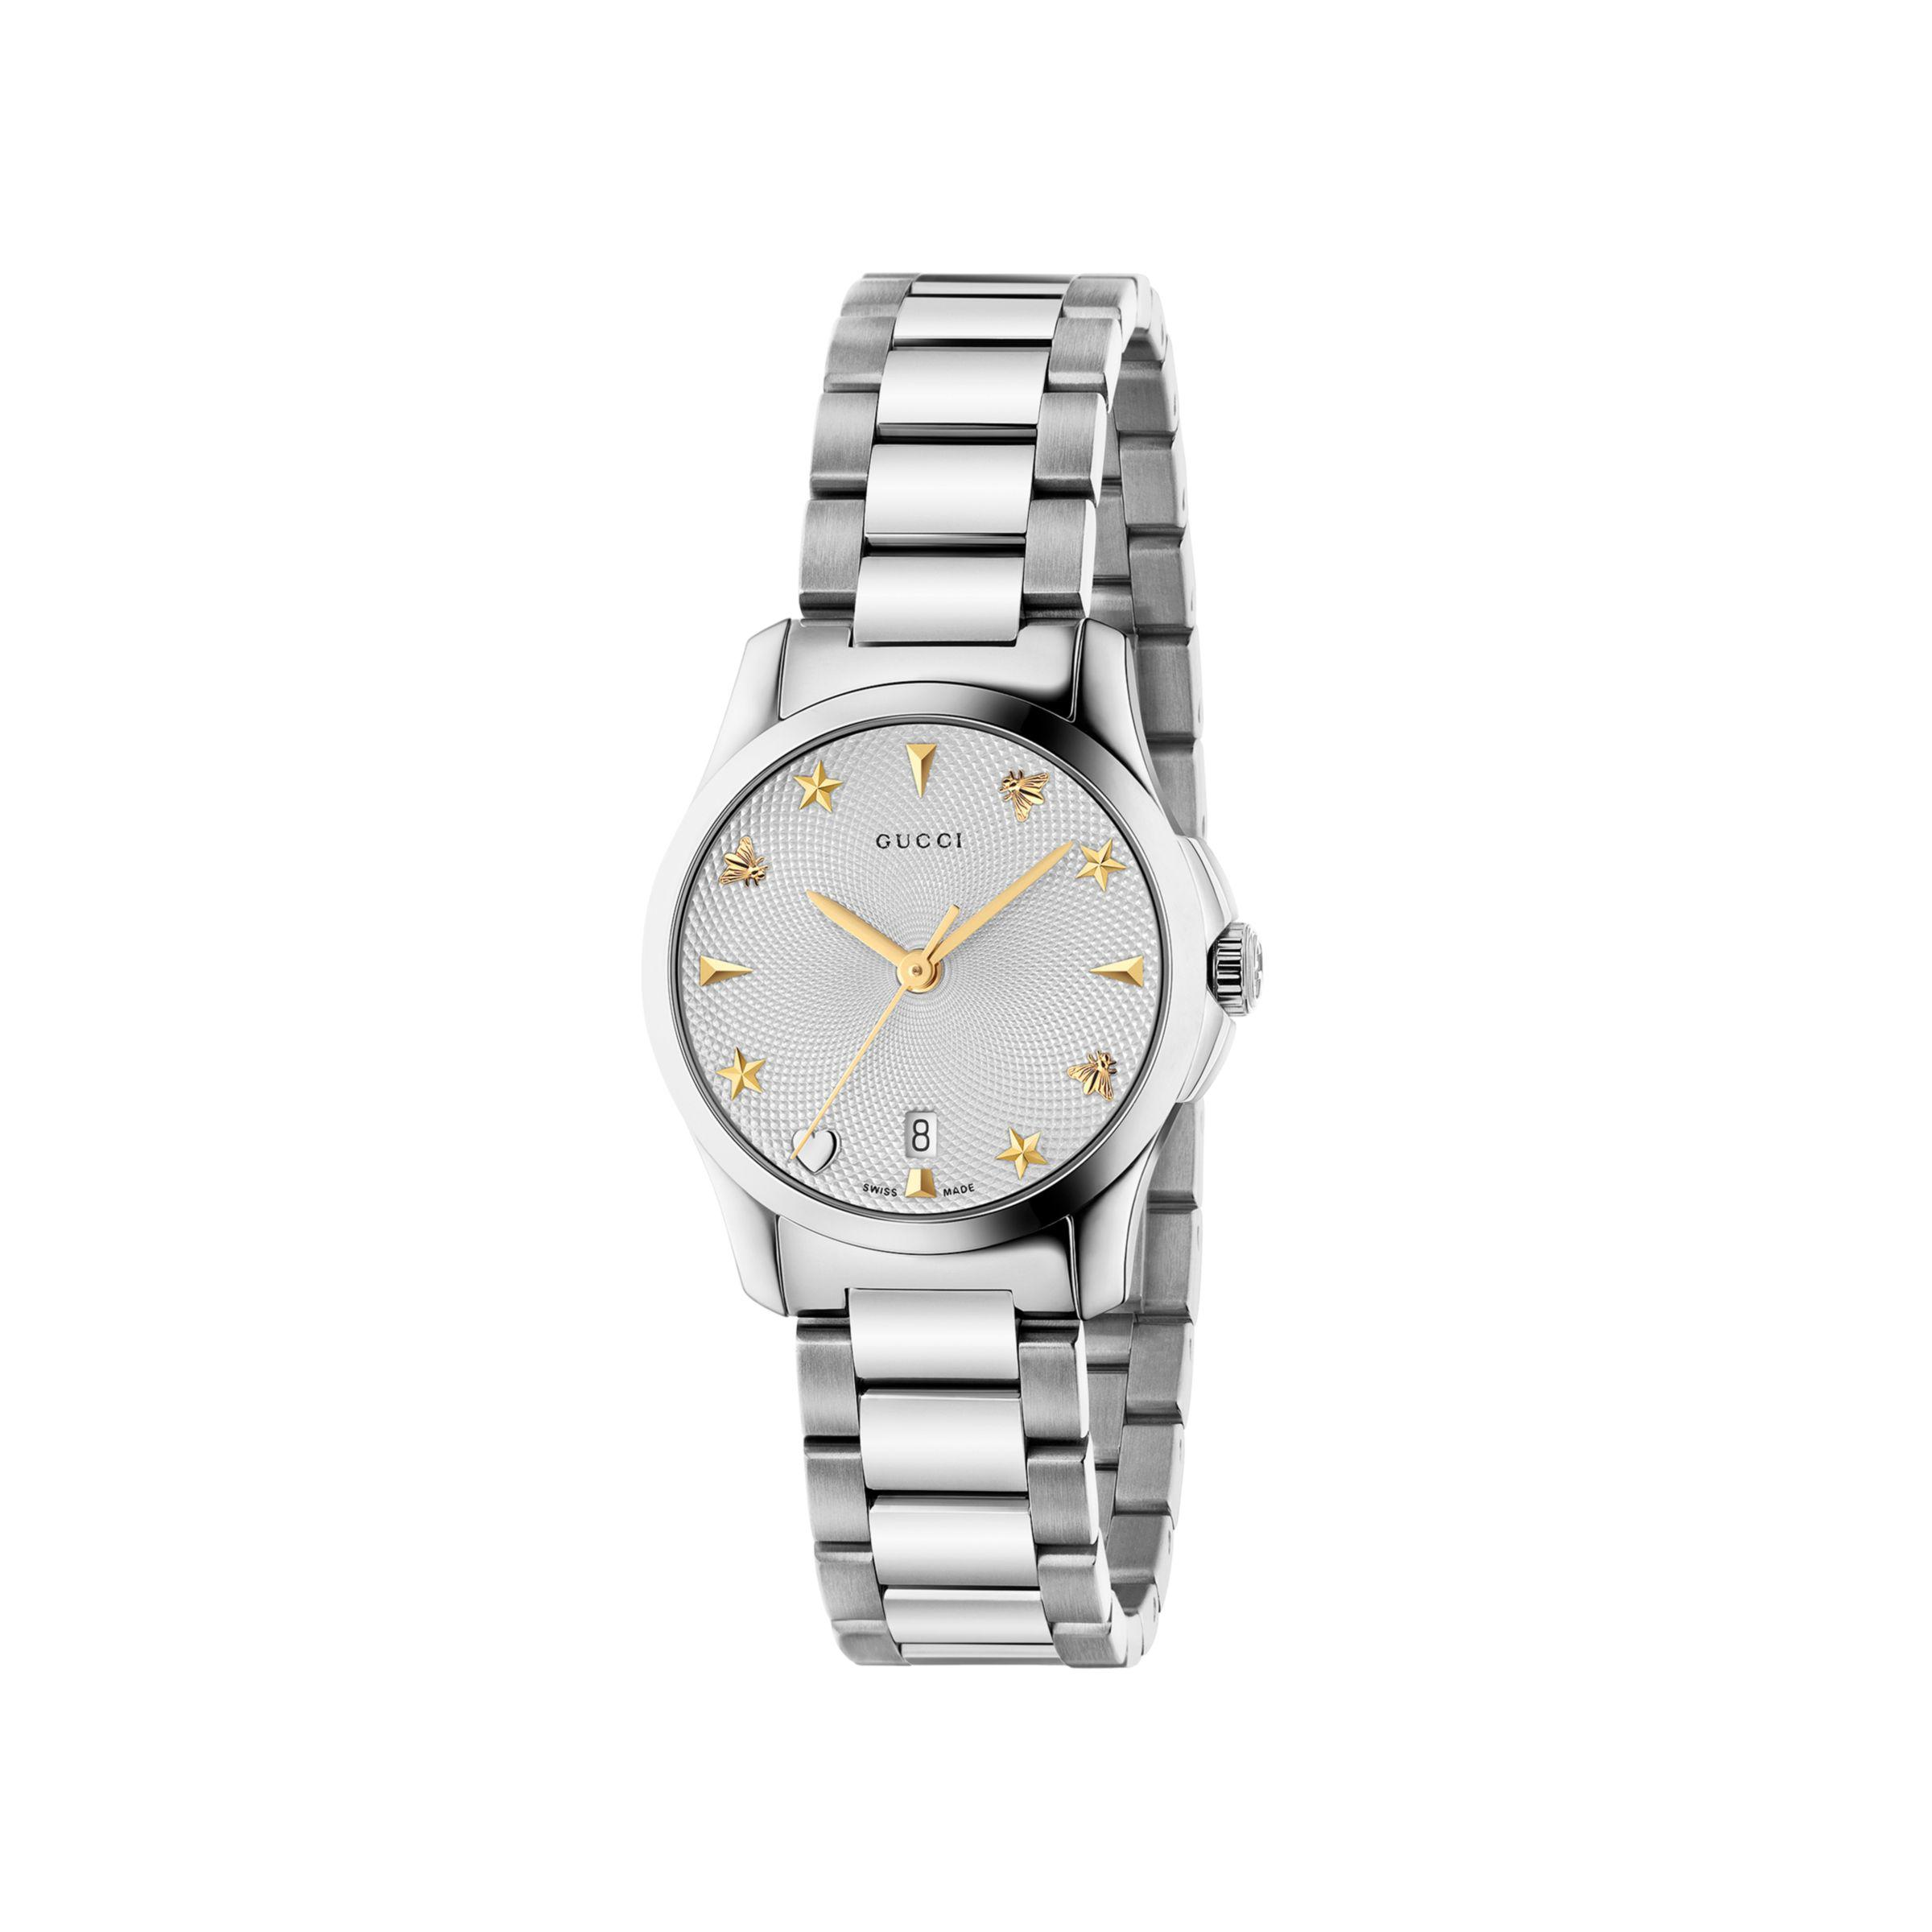 9b70f5c4c94 Gucci - Metallic Ya126572 Women s G-timeless Date Bracelet Strap Watch -  Lyst. View fullscreen